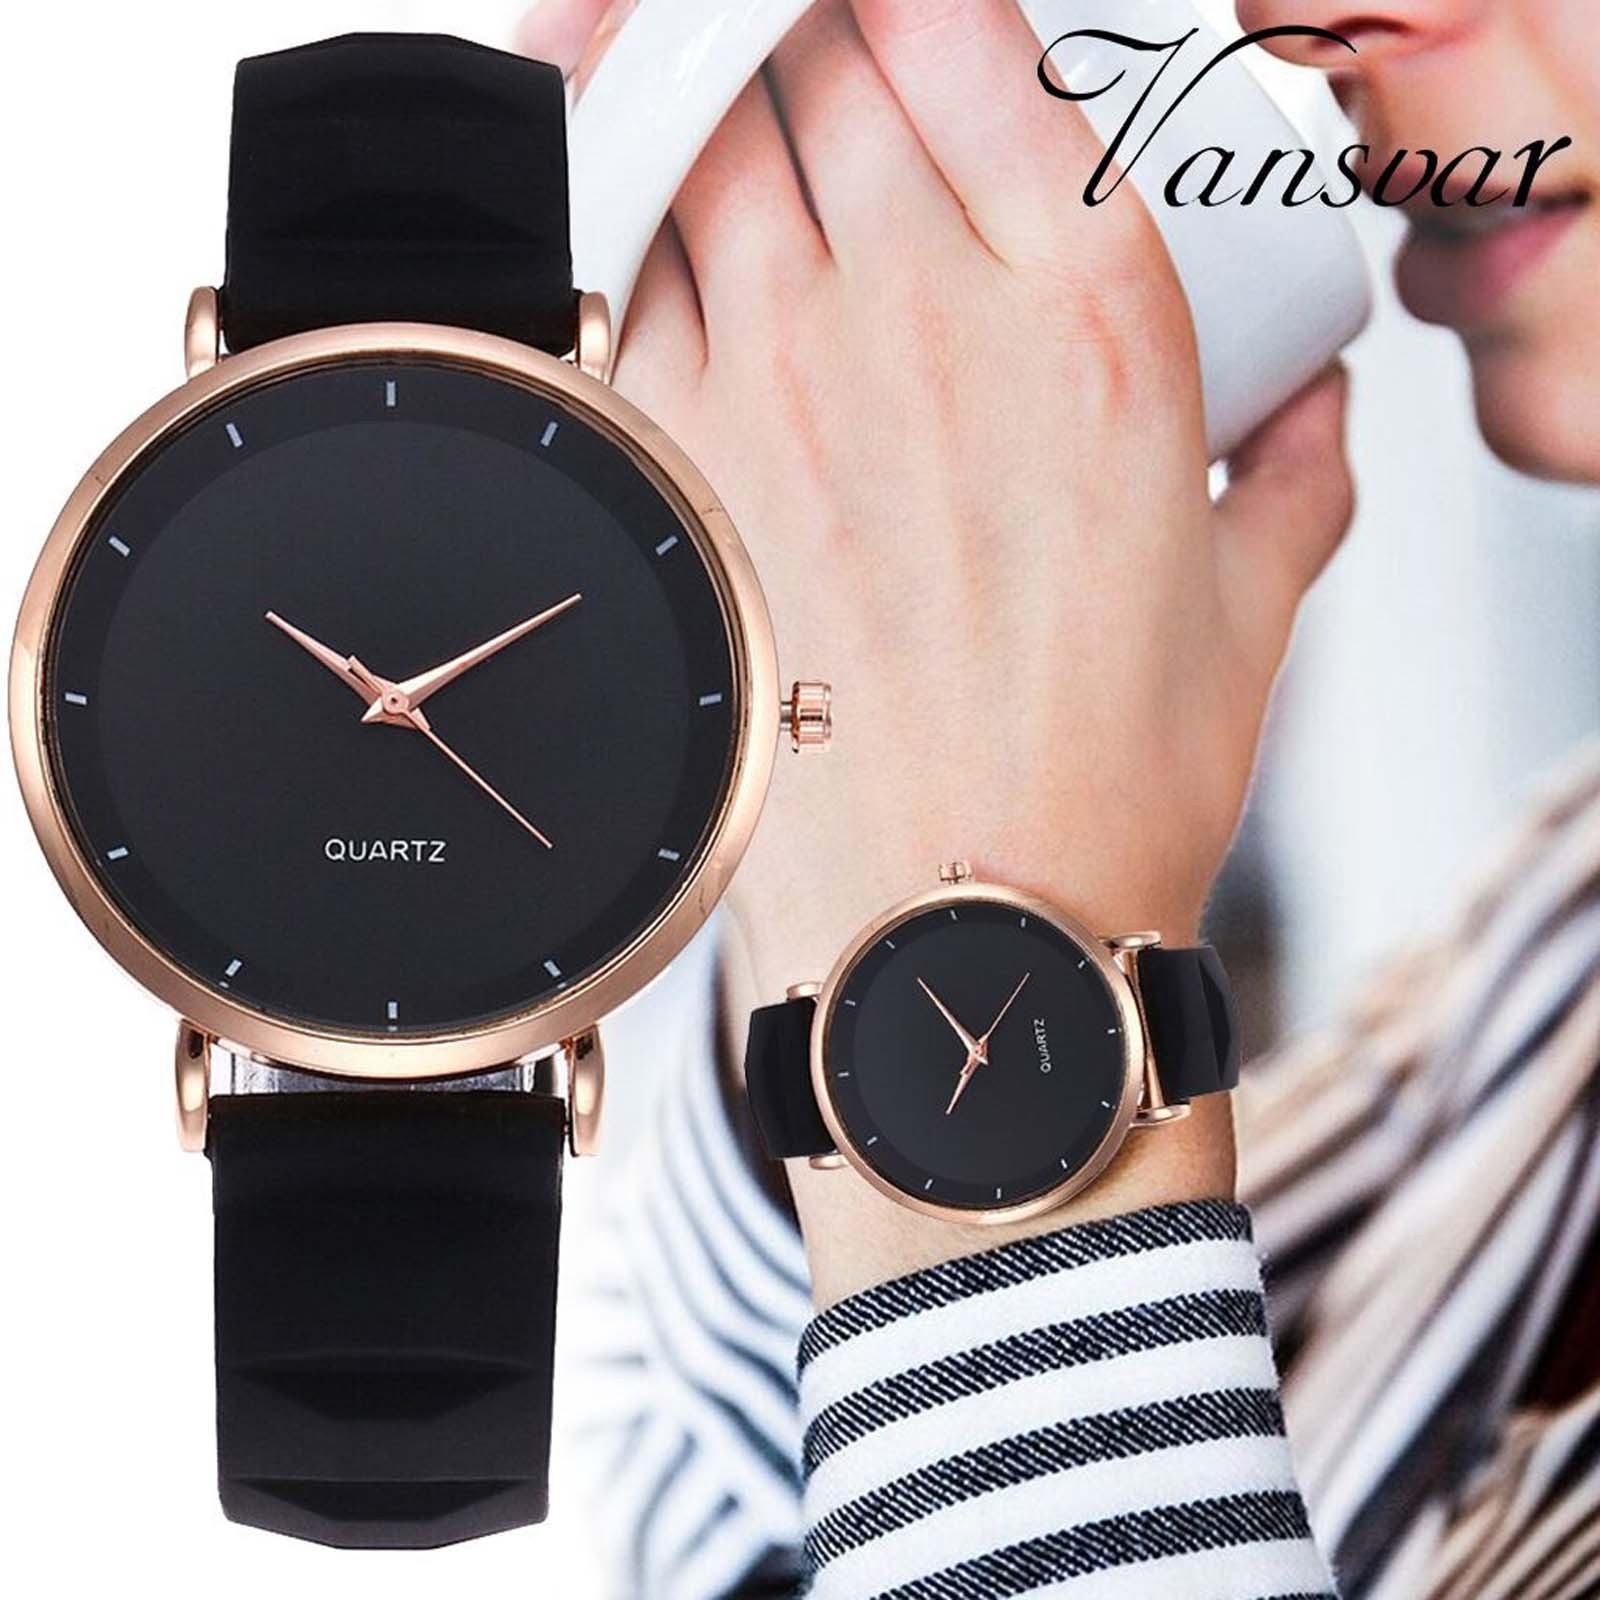 Round Dial Fashion Woman Watch Leather Strap Dial Women's Quartz Watch Gift Watch Часы Женс�